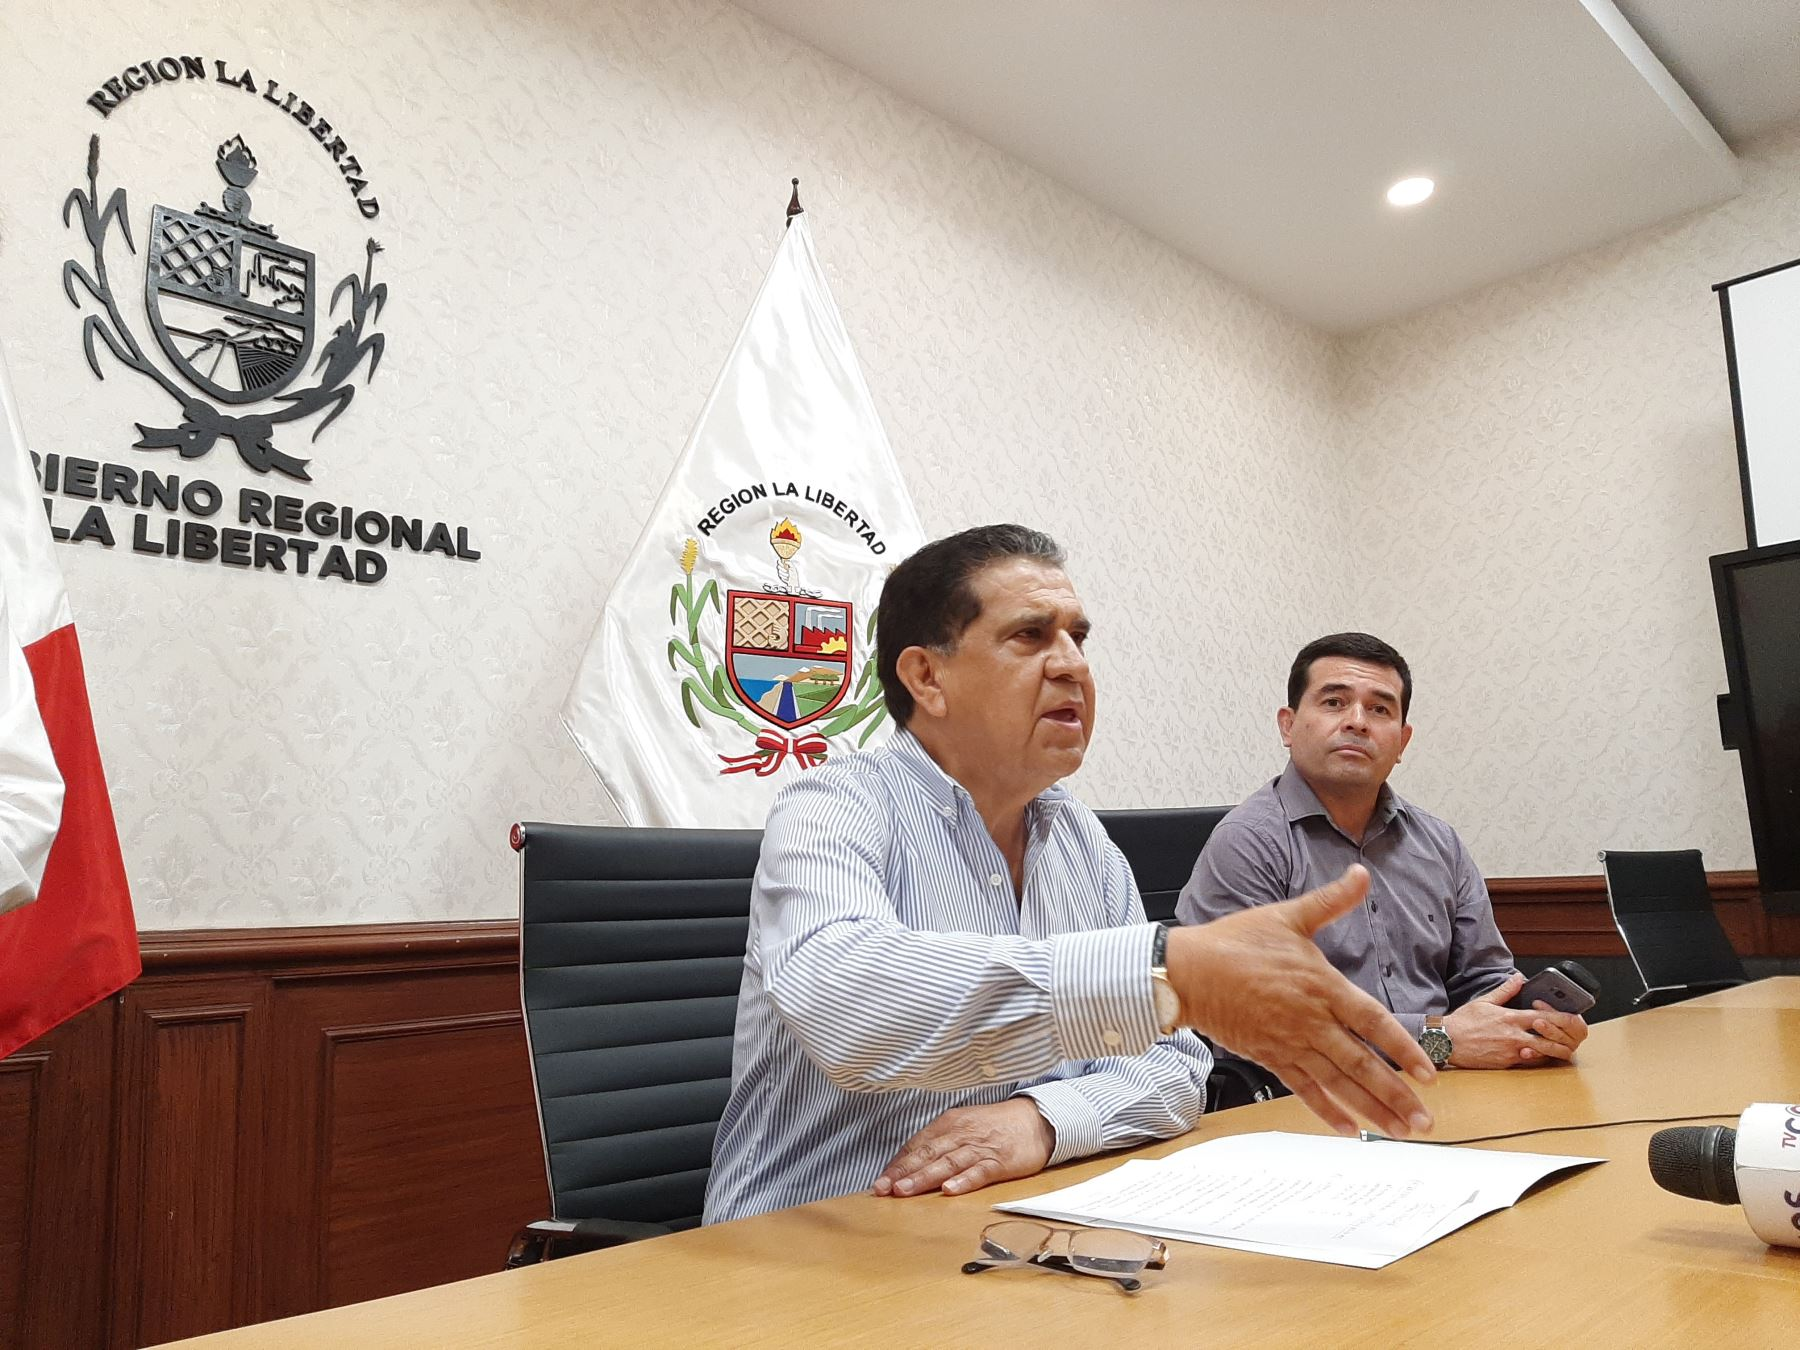 Gobernador regional de La Libertad, Manuel Llempén Coronel. Foto: Cortesía